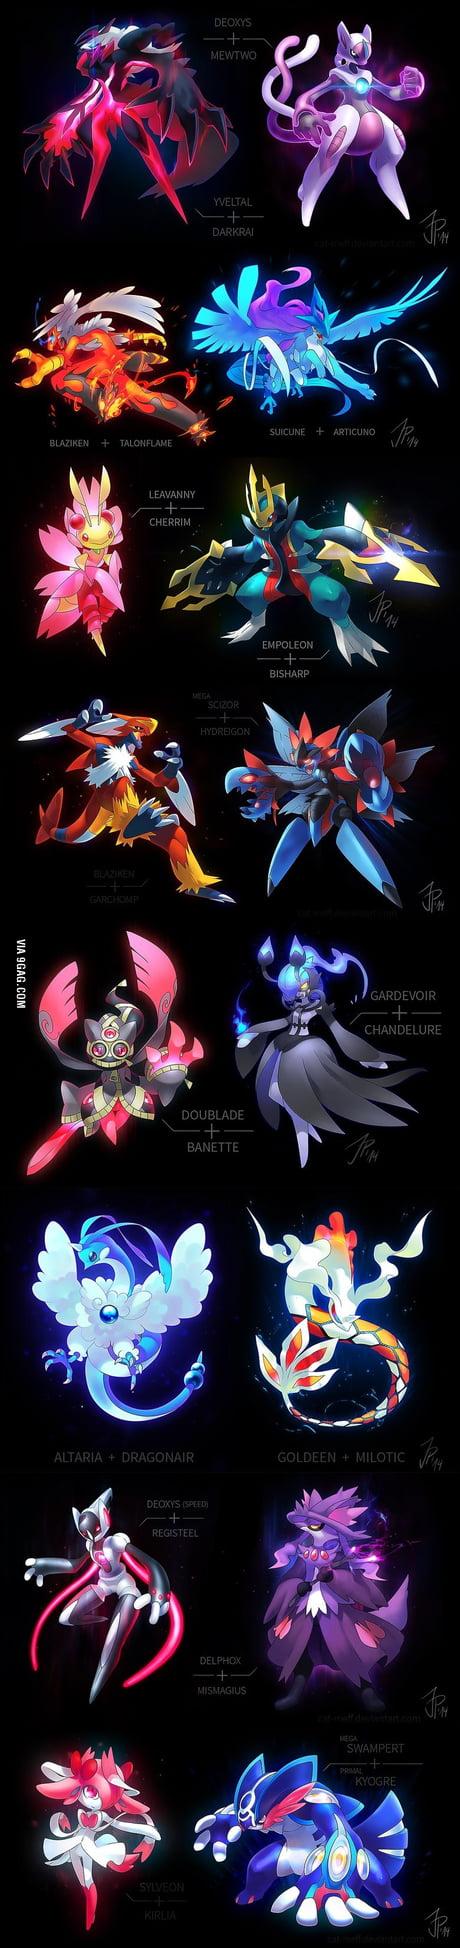 Just awesome Pokémon stuff Ae3Kqdj_460s_v1